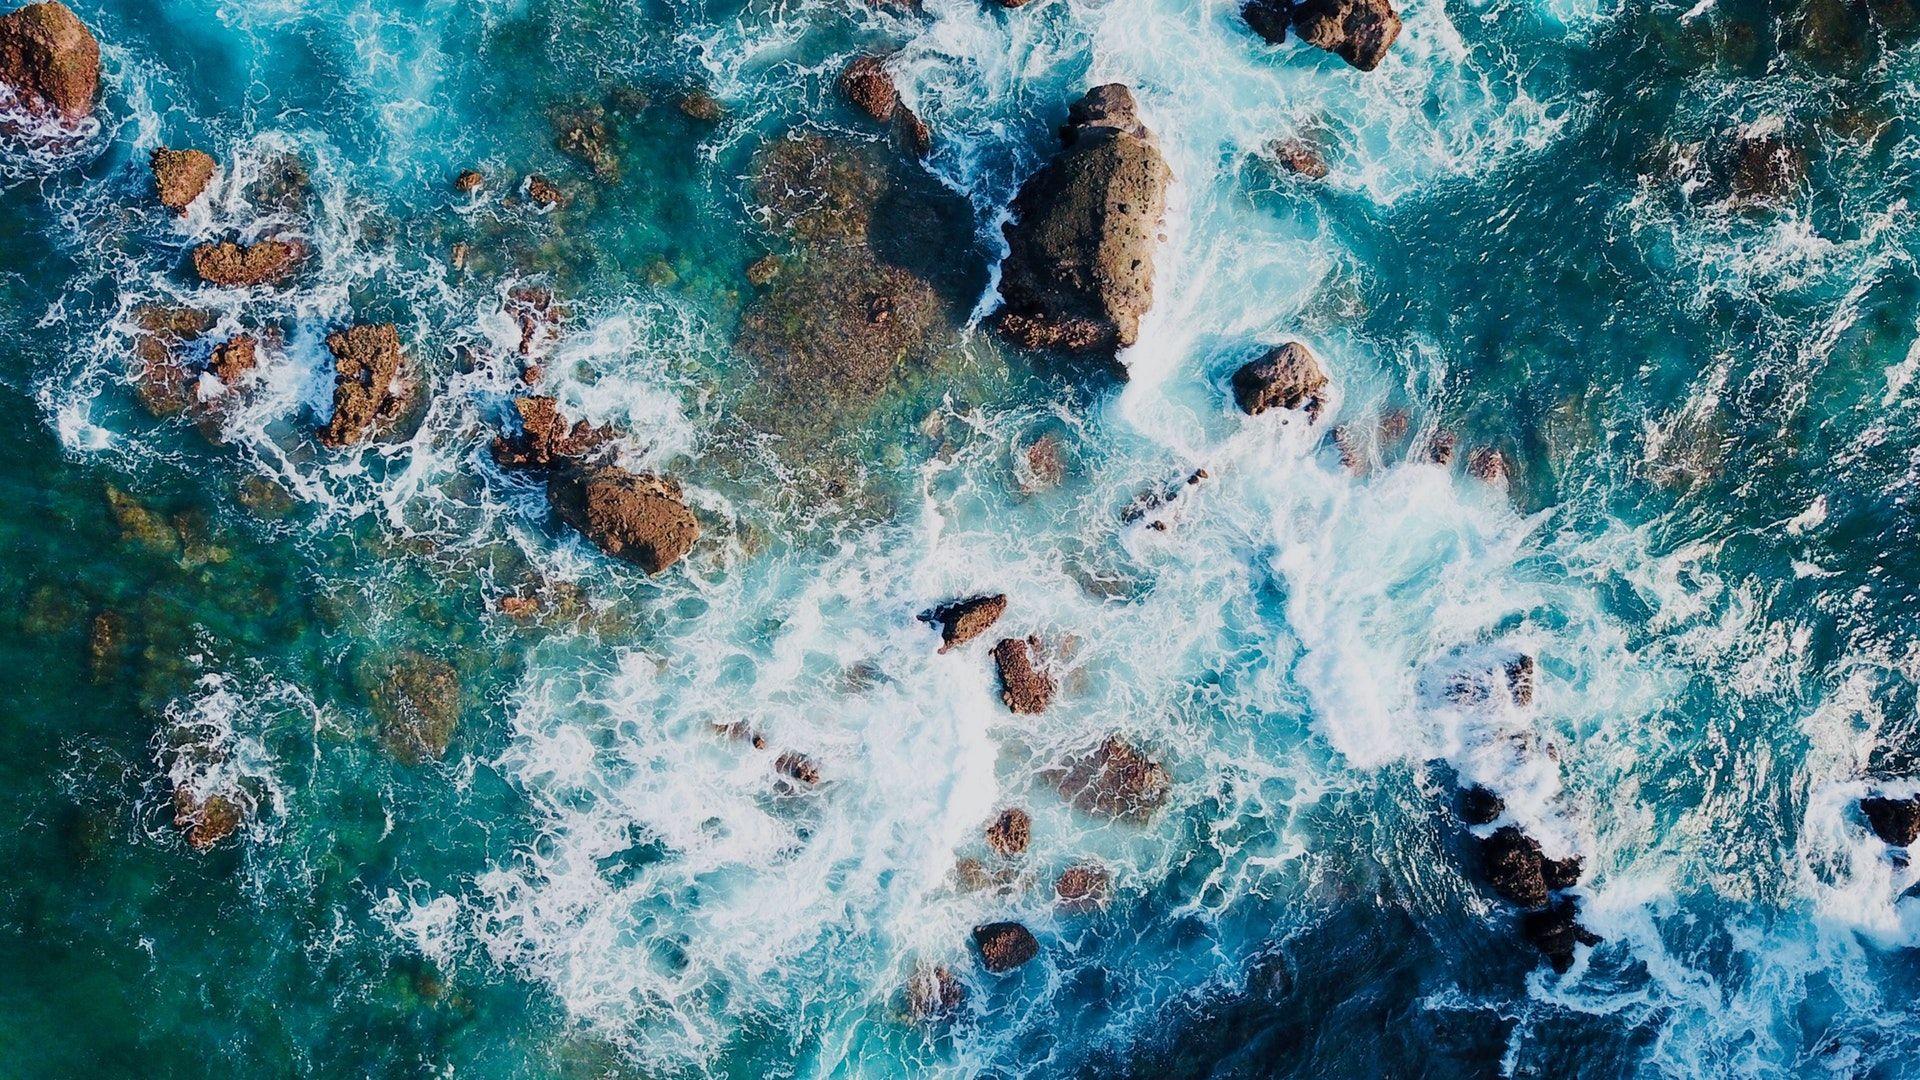 Water Foam At The Seaside Hd Wallpaper Free Image Download High Resolutio Summer Desktop Backgrounds Laptop Wallpaper Desktop Wallpapers Summer Wallpaper